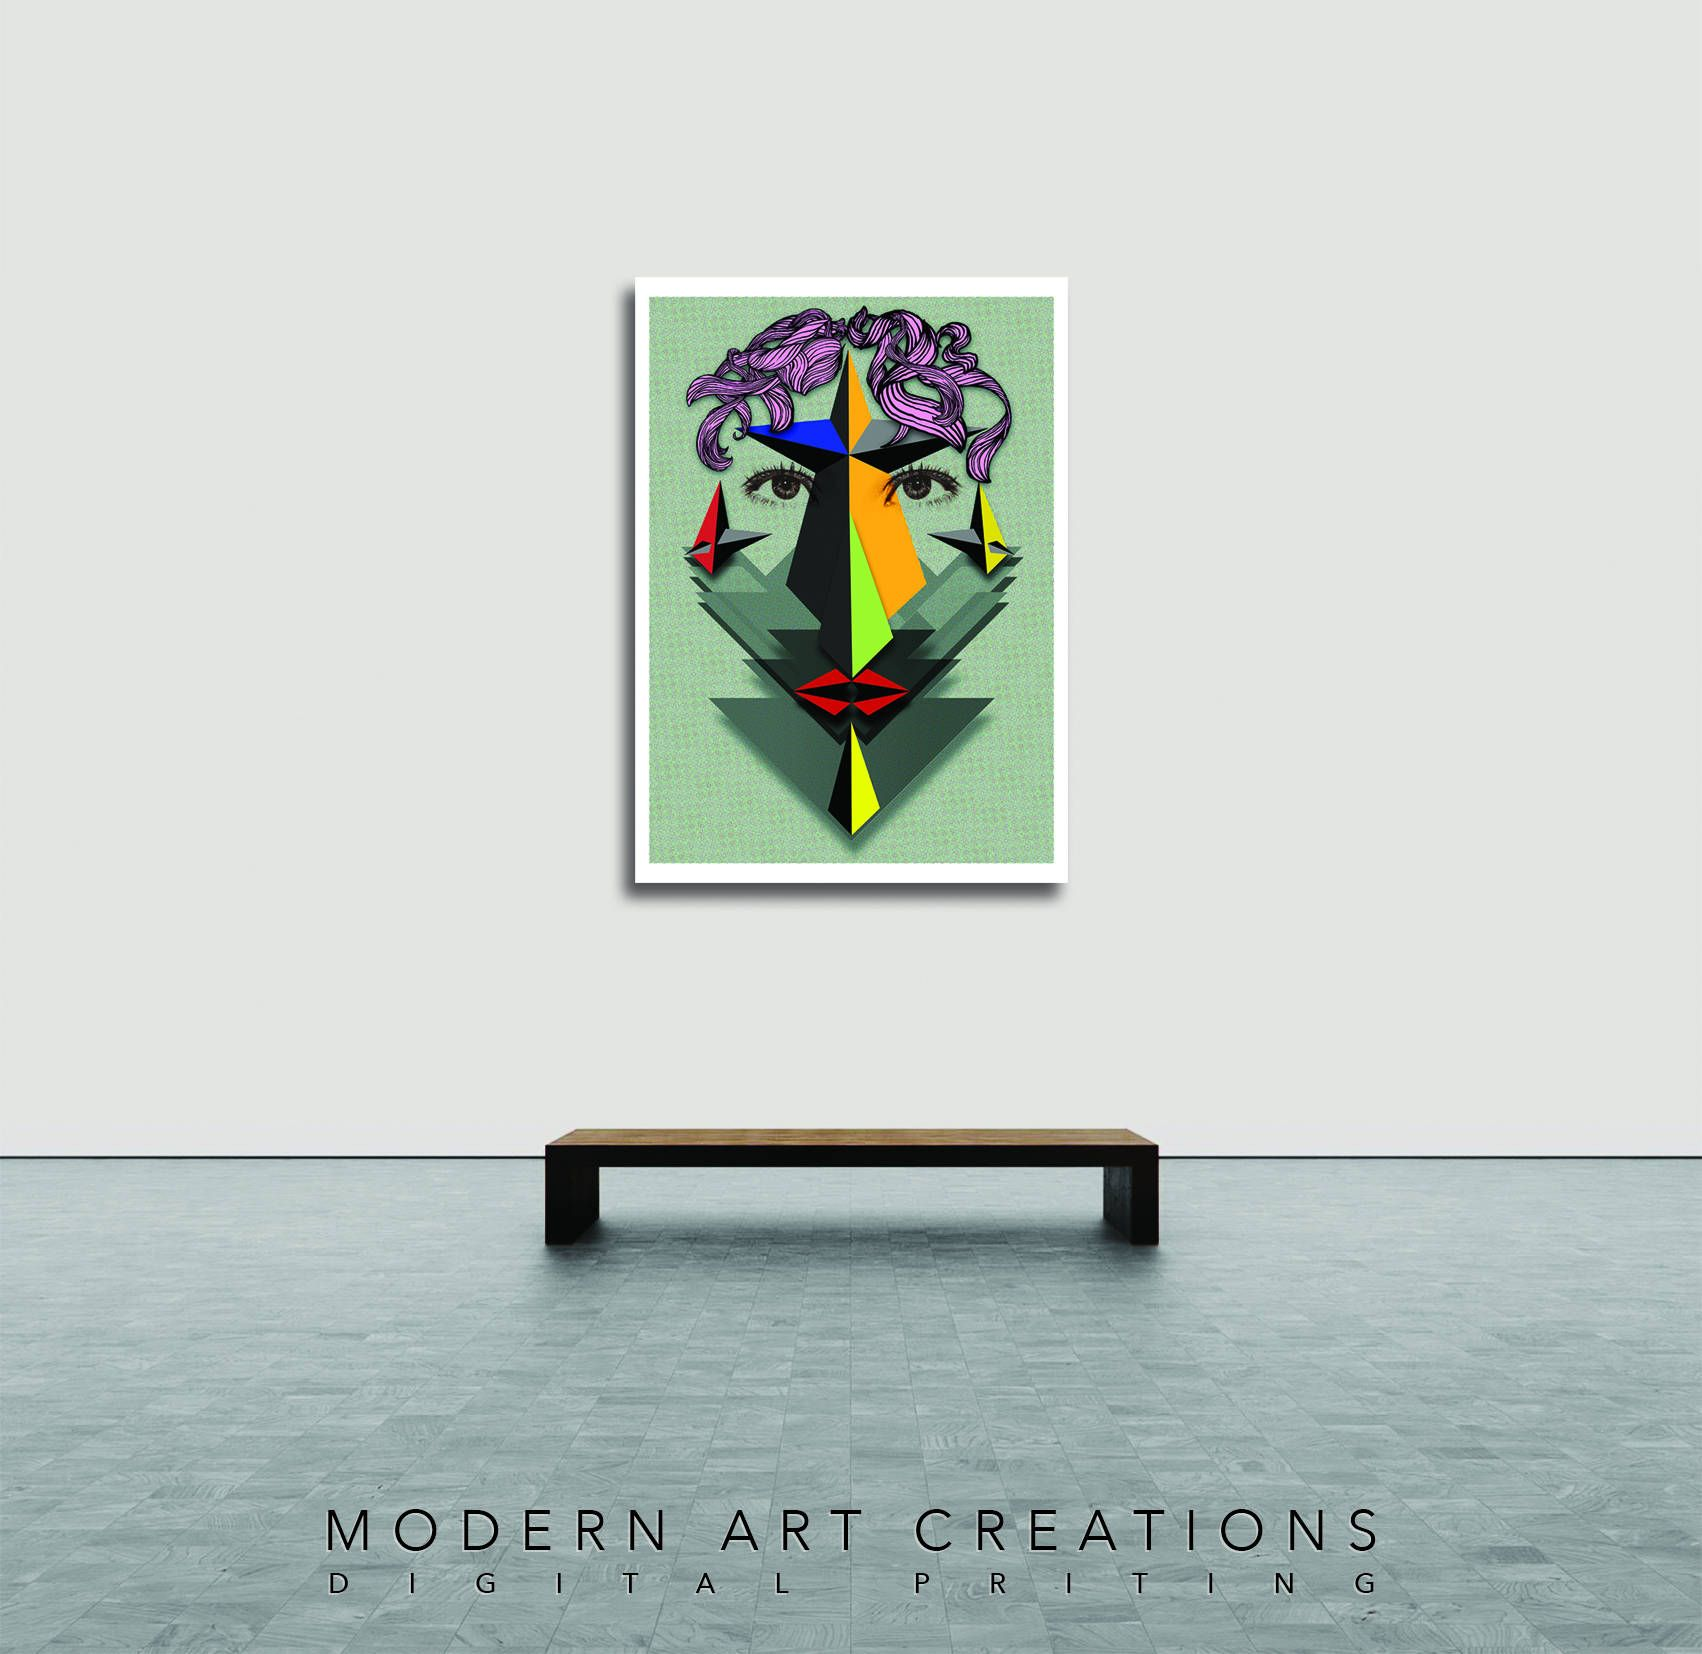 Pop art collage modern women gift women green poster decoration ideas girls decor large poster ideas for living room h70 x w50cm